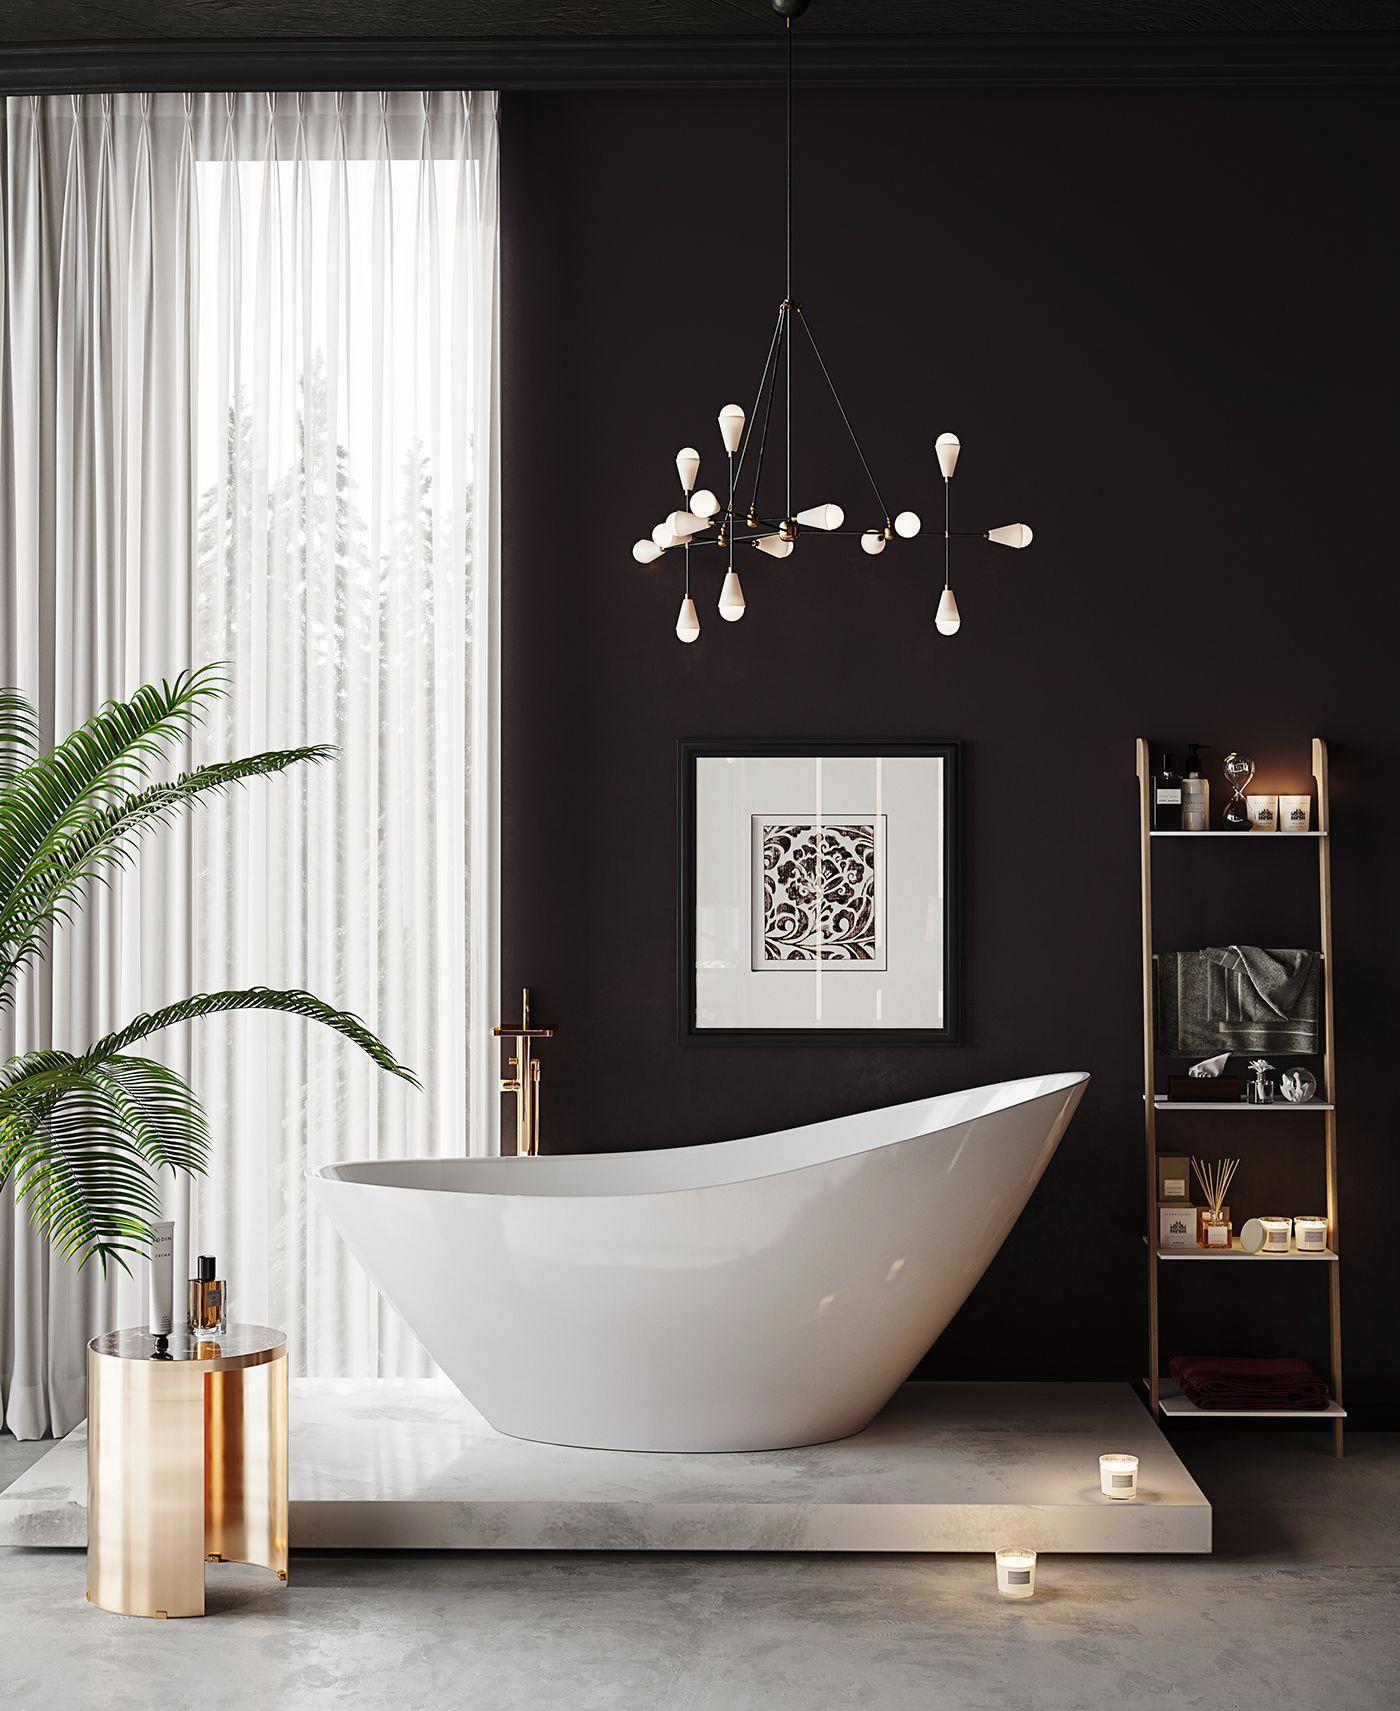 Black And White Bathroom Wall Decor Ideas